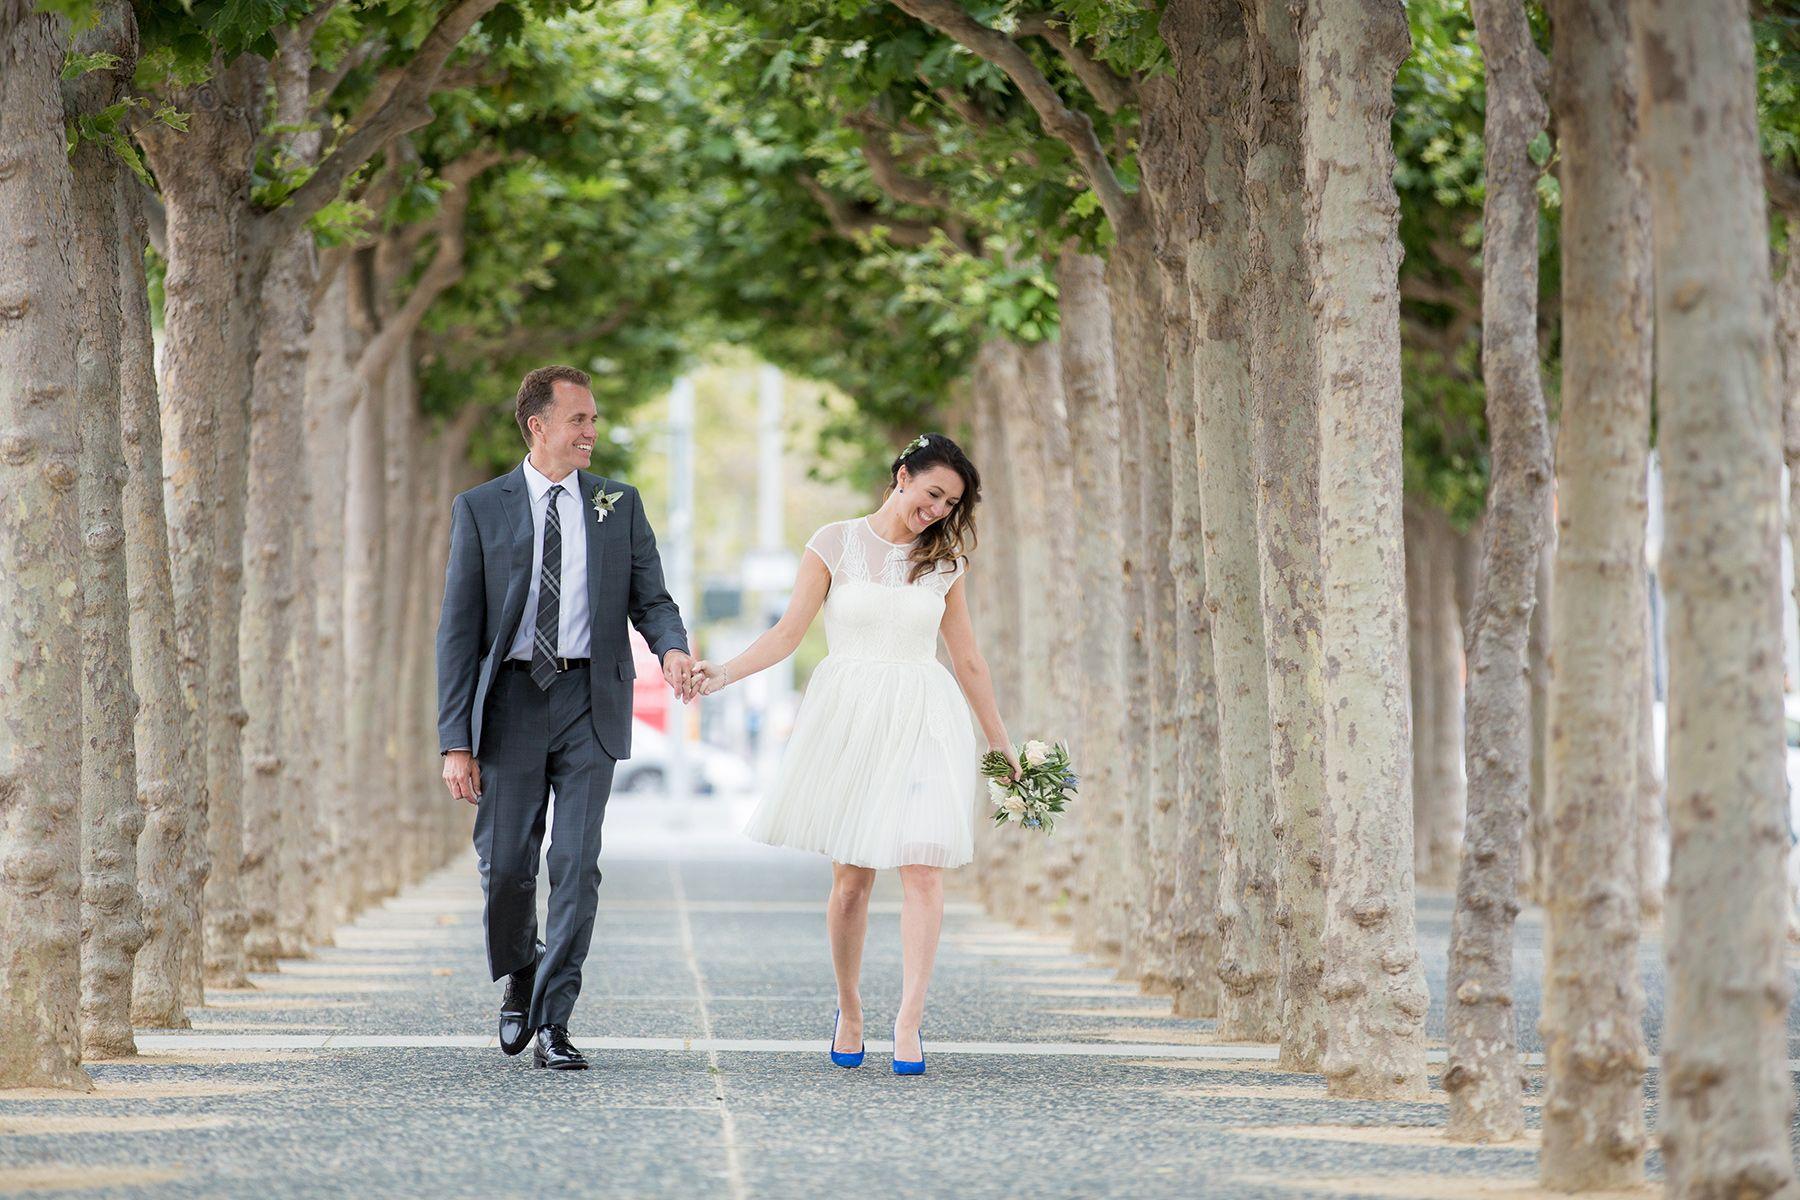 Sarah And Troy S Sf City Hall Wedding T J Salsman Photography Napa Valley Elopement Portrait Photographer Sanfrancisco